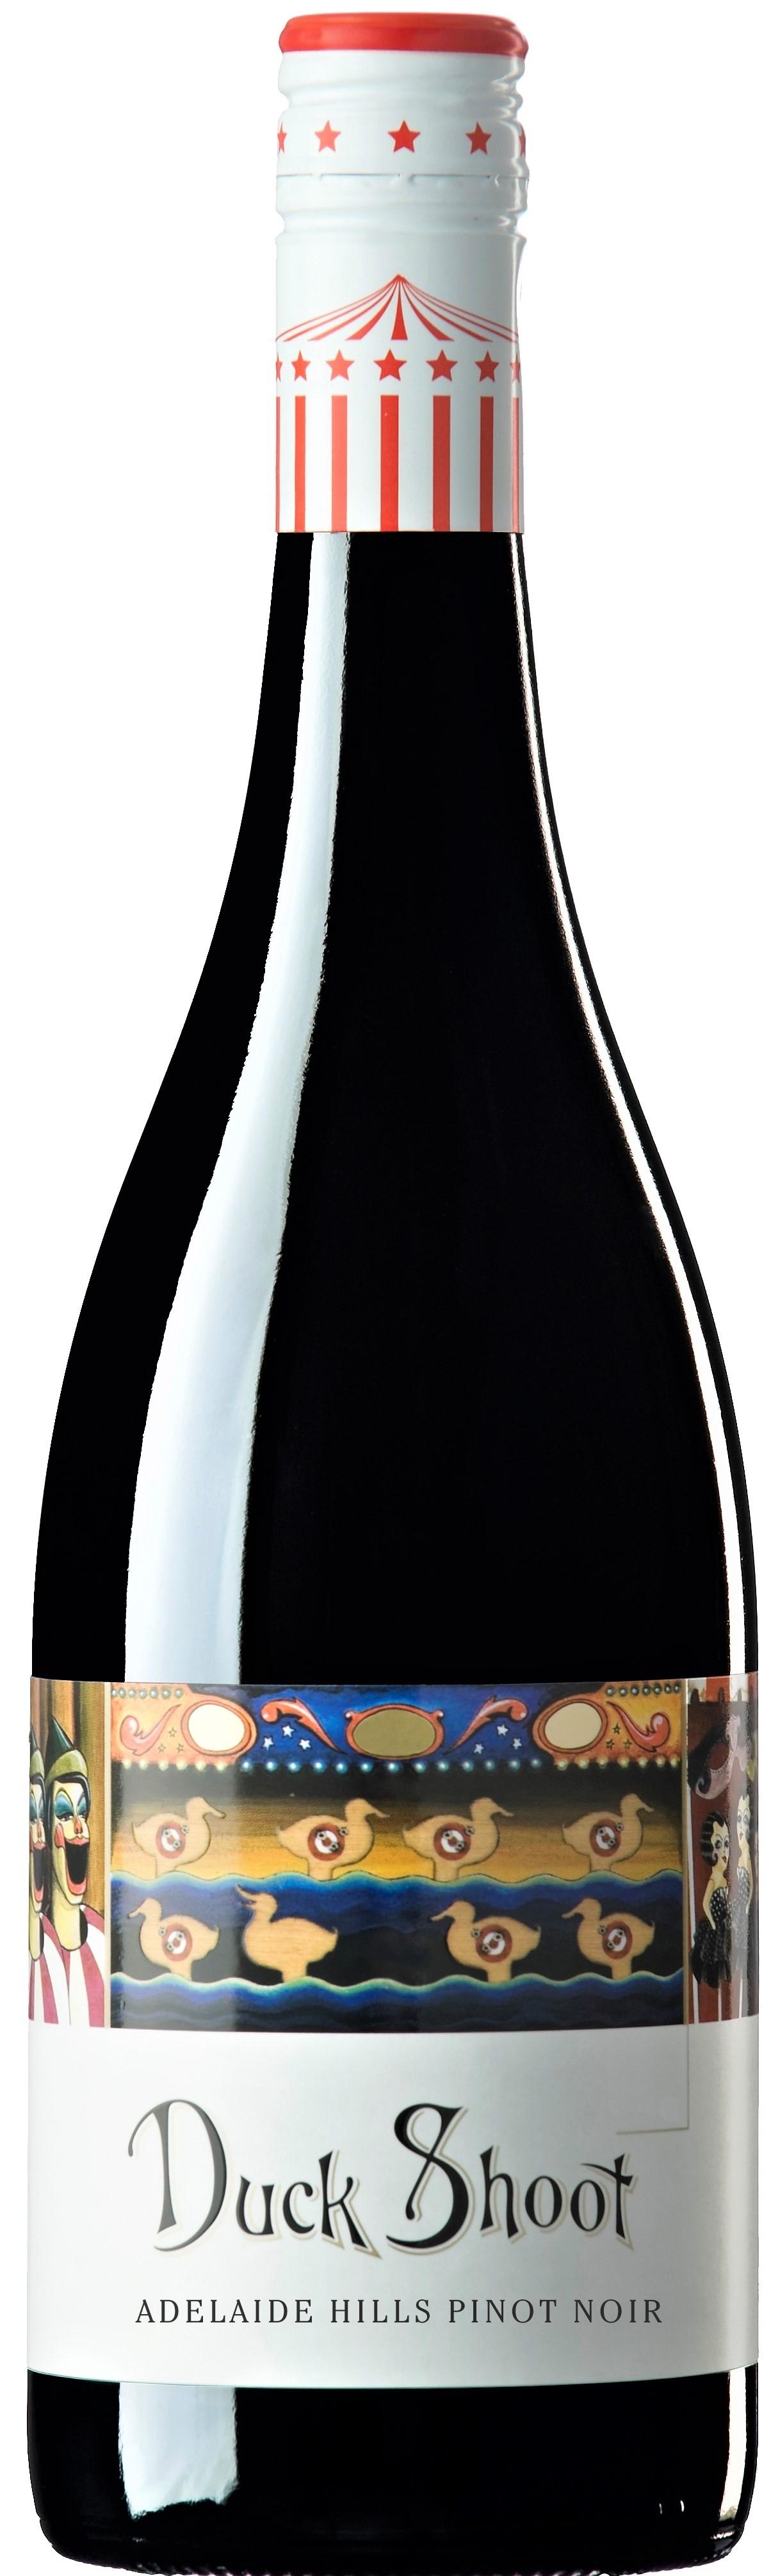 Caudalia wine Box Enero 2020 Pinot Noir Australia